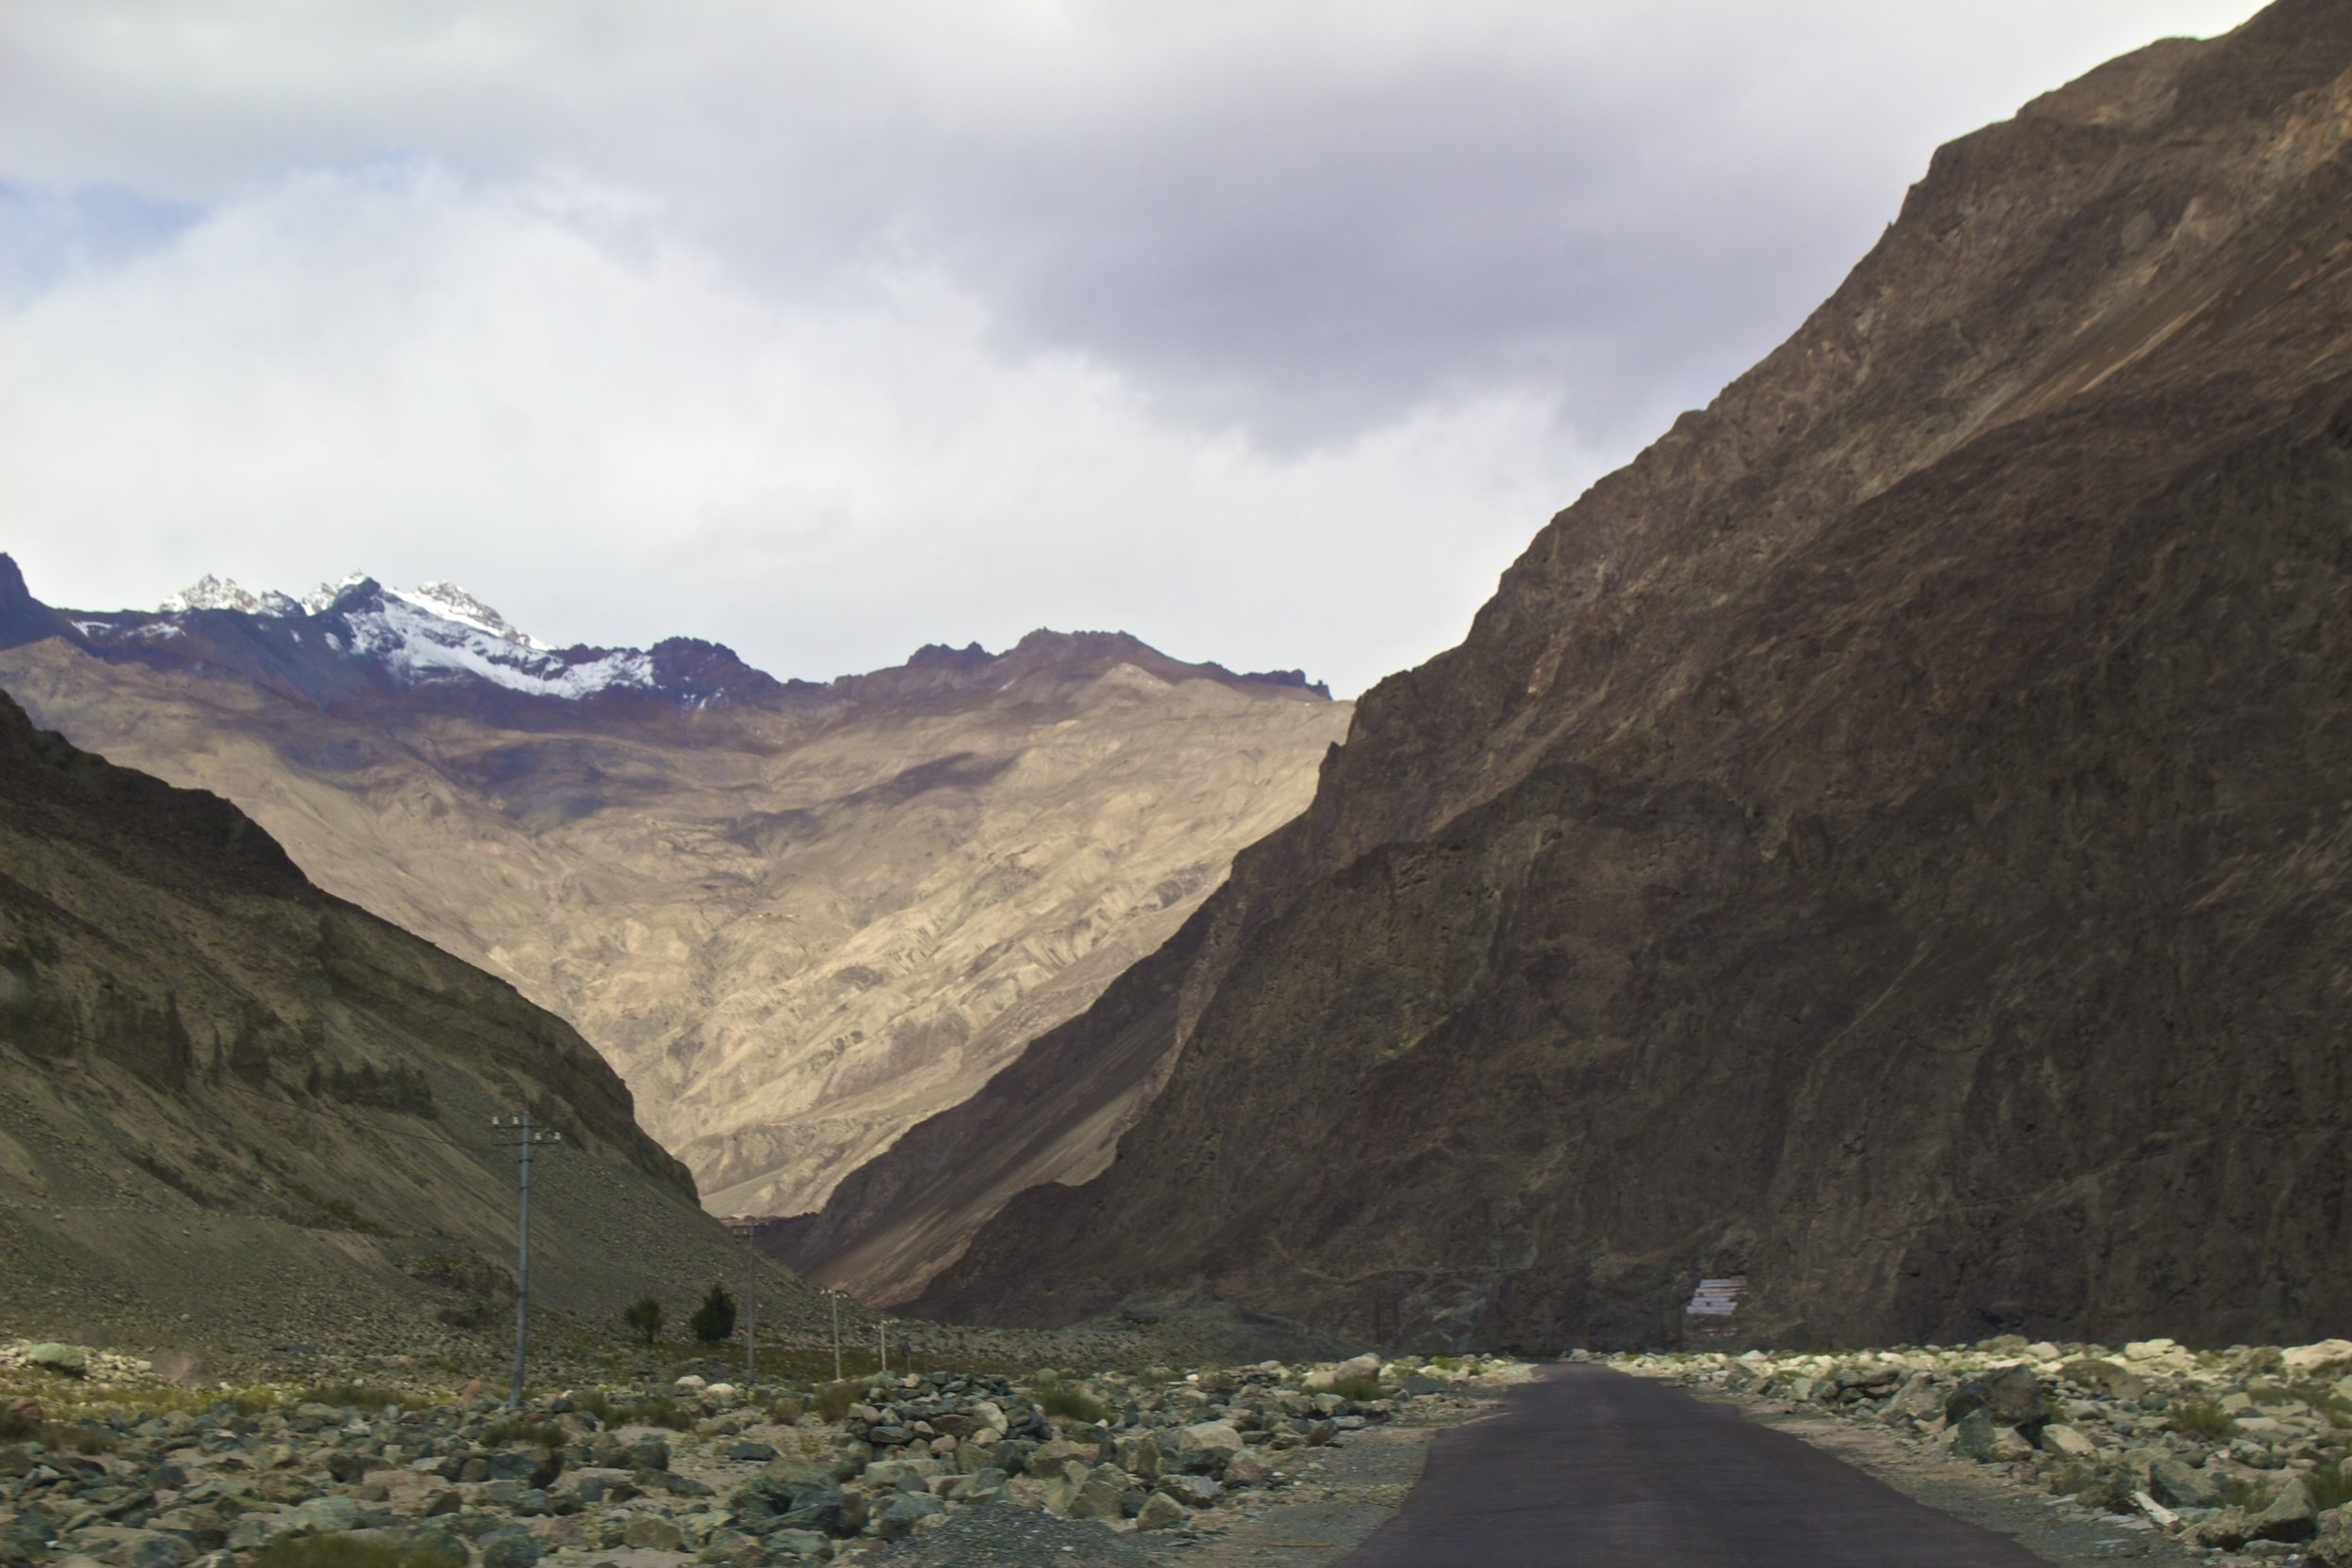 kashmir gilgit baltistan roads 3.jpg